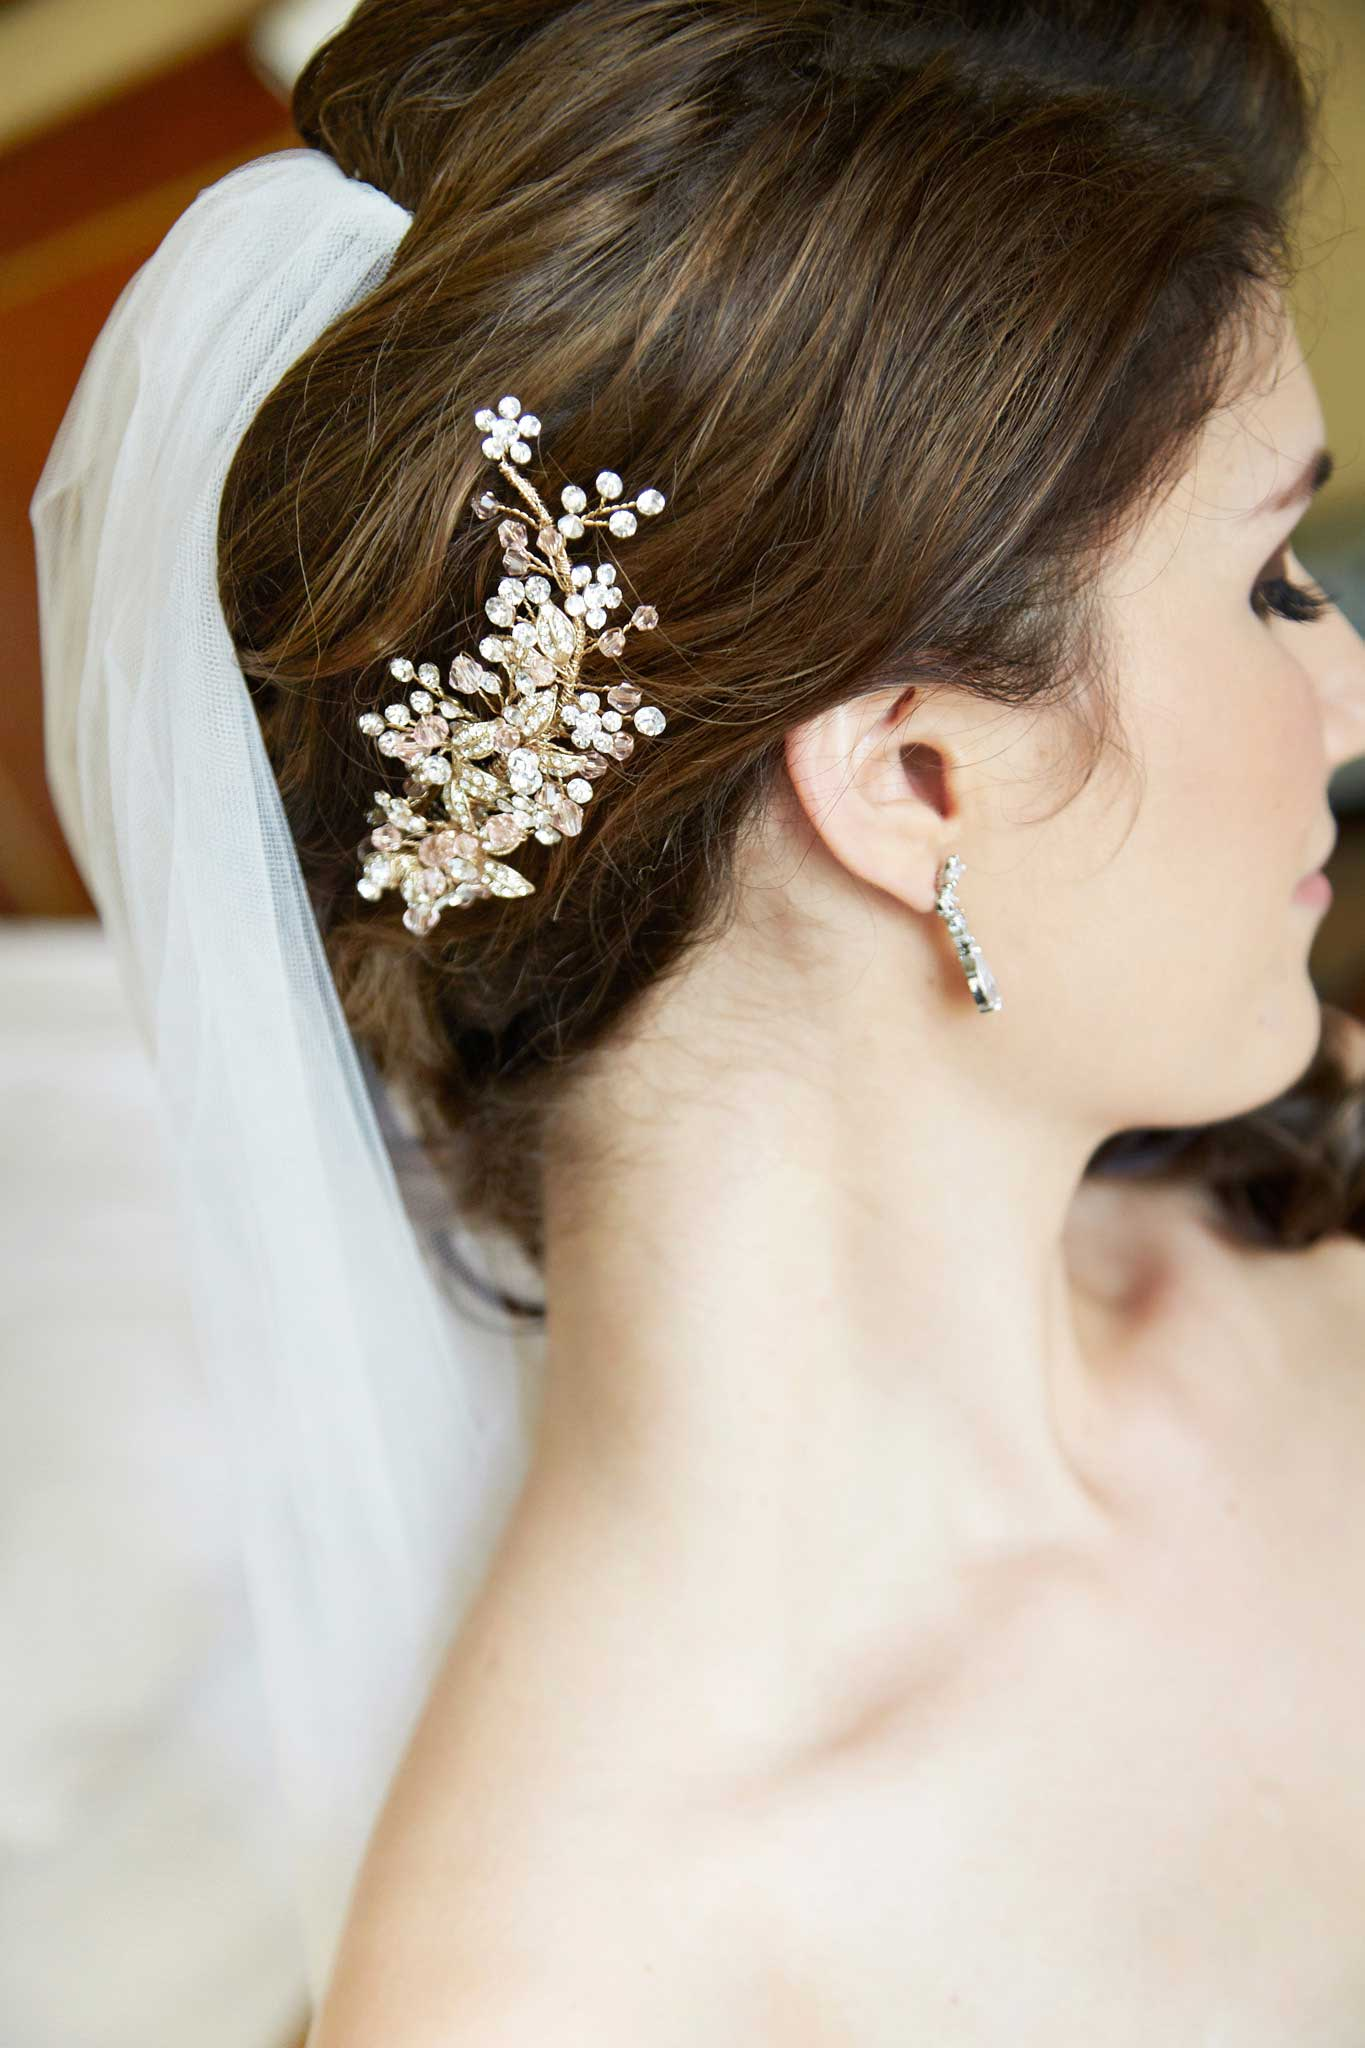 Pretty flower motif hair accessory with veil